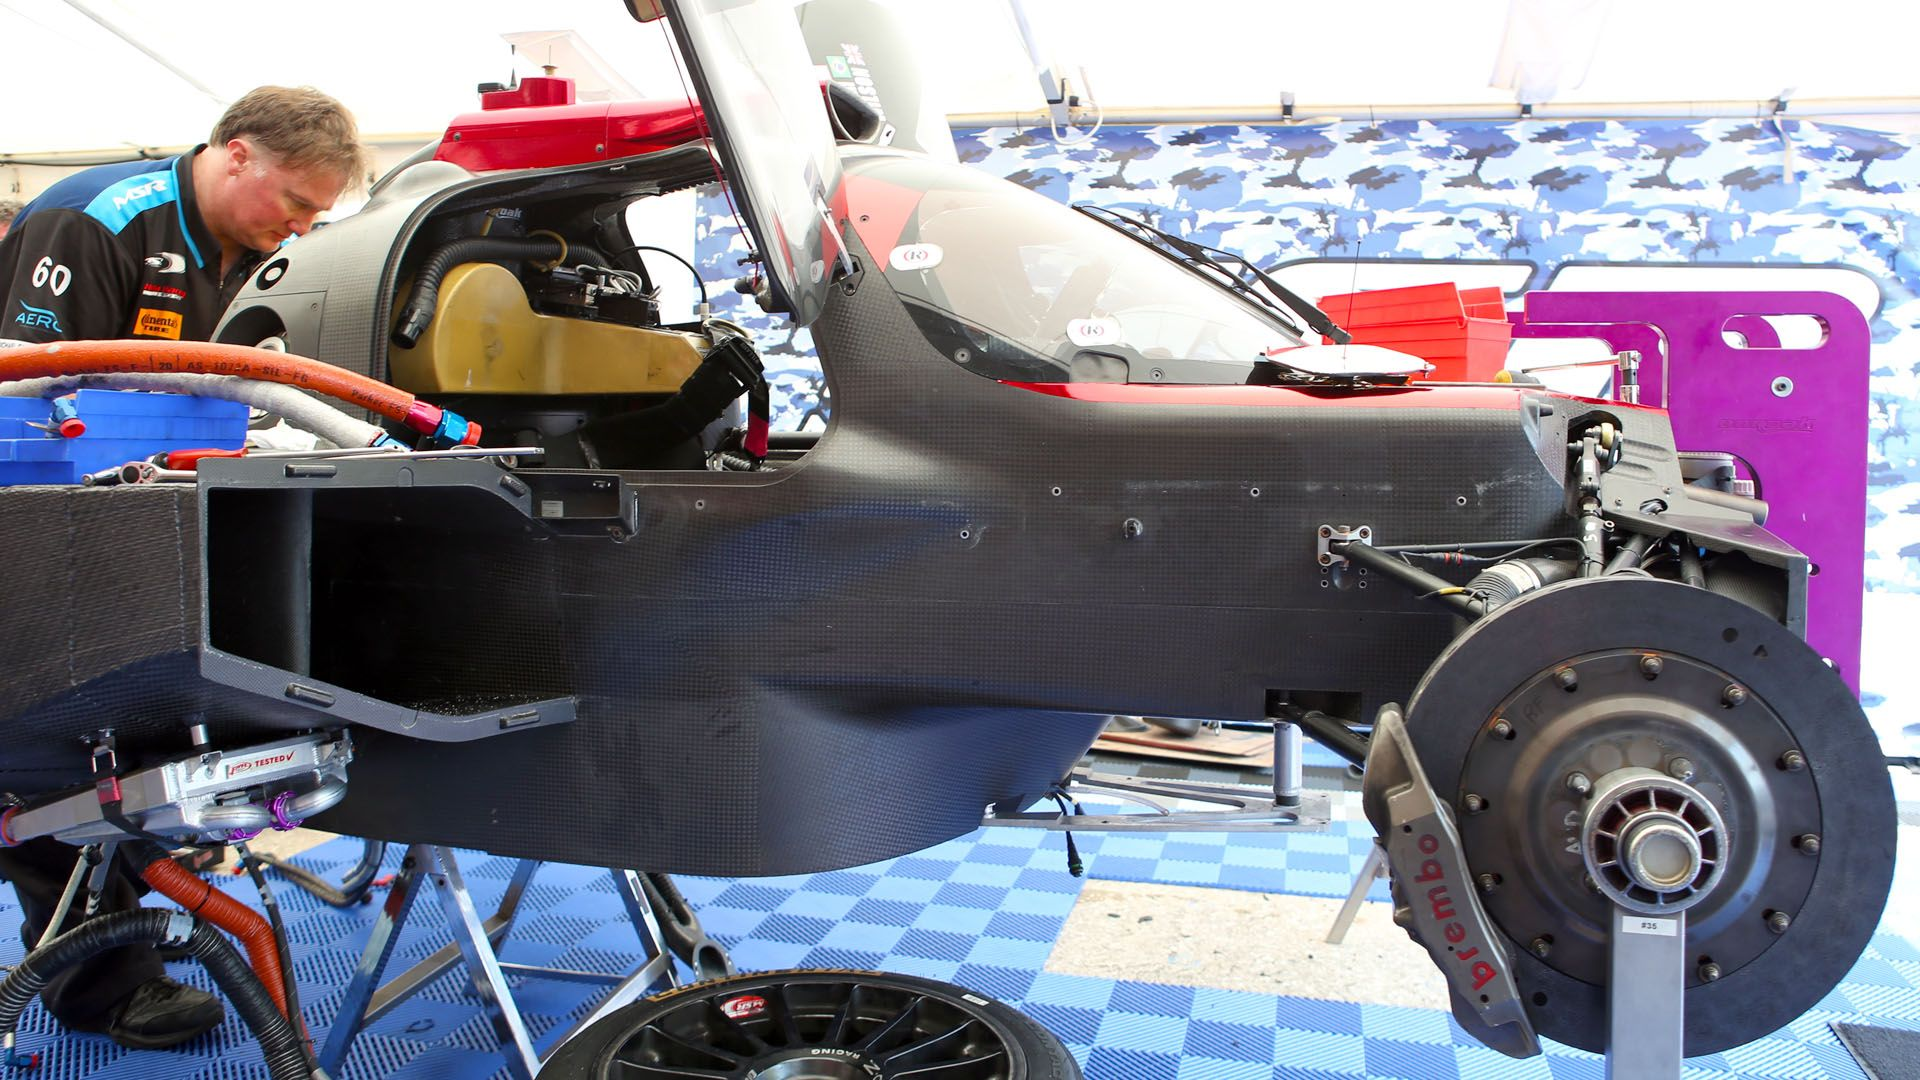 60 Michael Shank Racing Ligier Honda &#xA&#x3B;John Pew / Palm Beach, FL&#xA&#x3B;Oswaldo Negri, Jr. / Aventura, FL&#xA&#x3B;AJ Allmendinger / Denver, NC&#xA&#x3B;Matt McMurry / Phoenix, AZ&#xA&#x3B;© Marshall Pruett 2015,